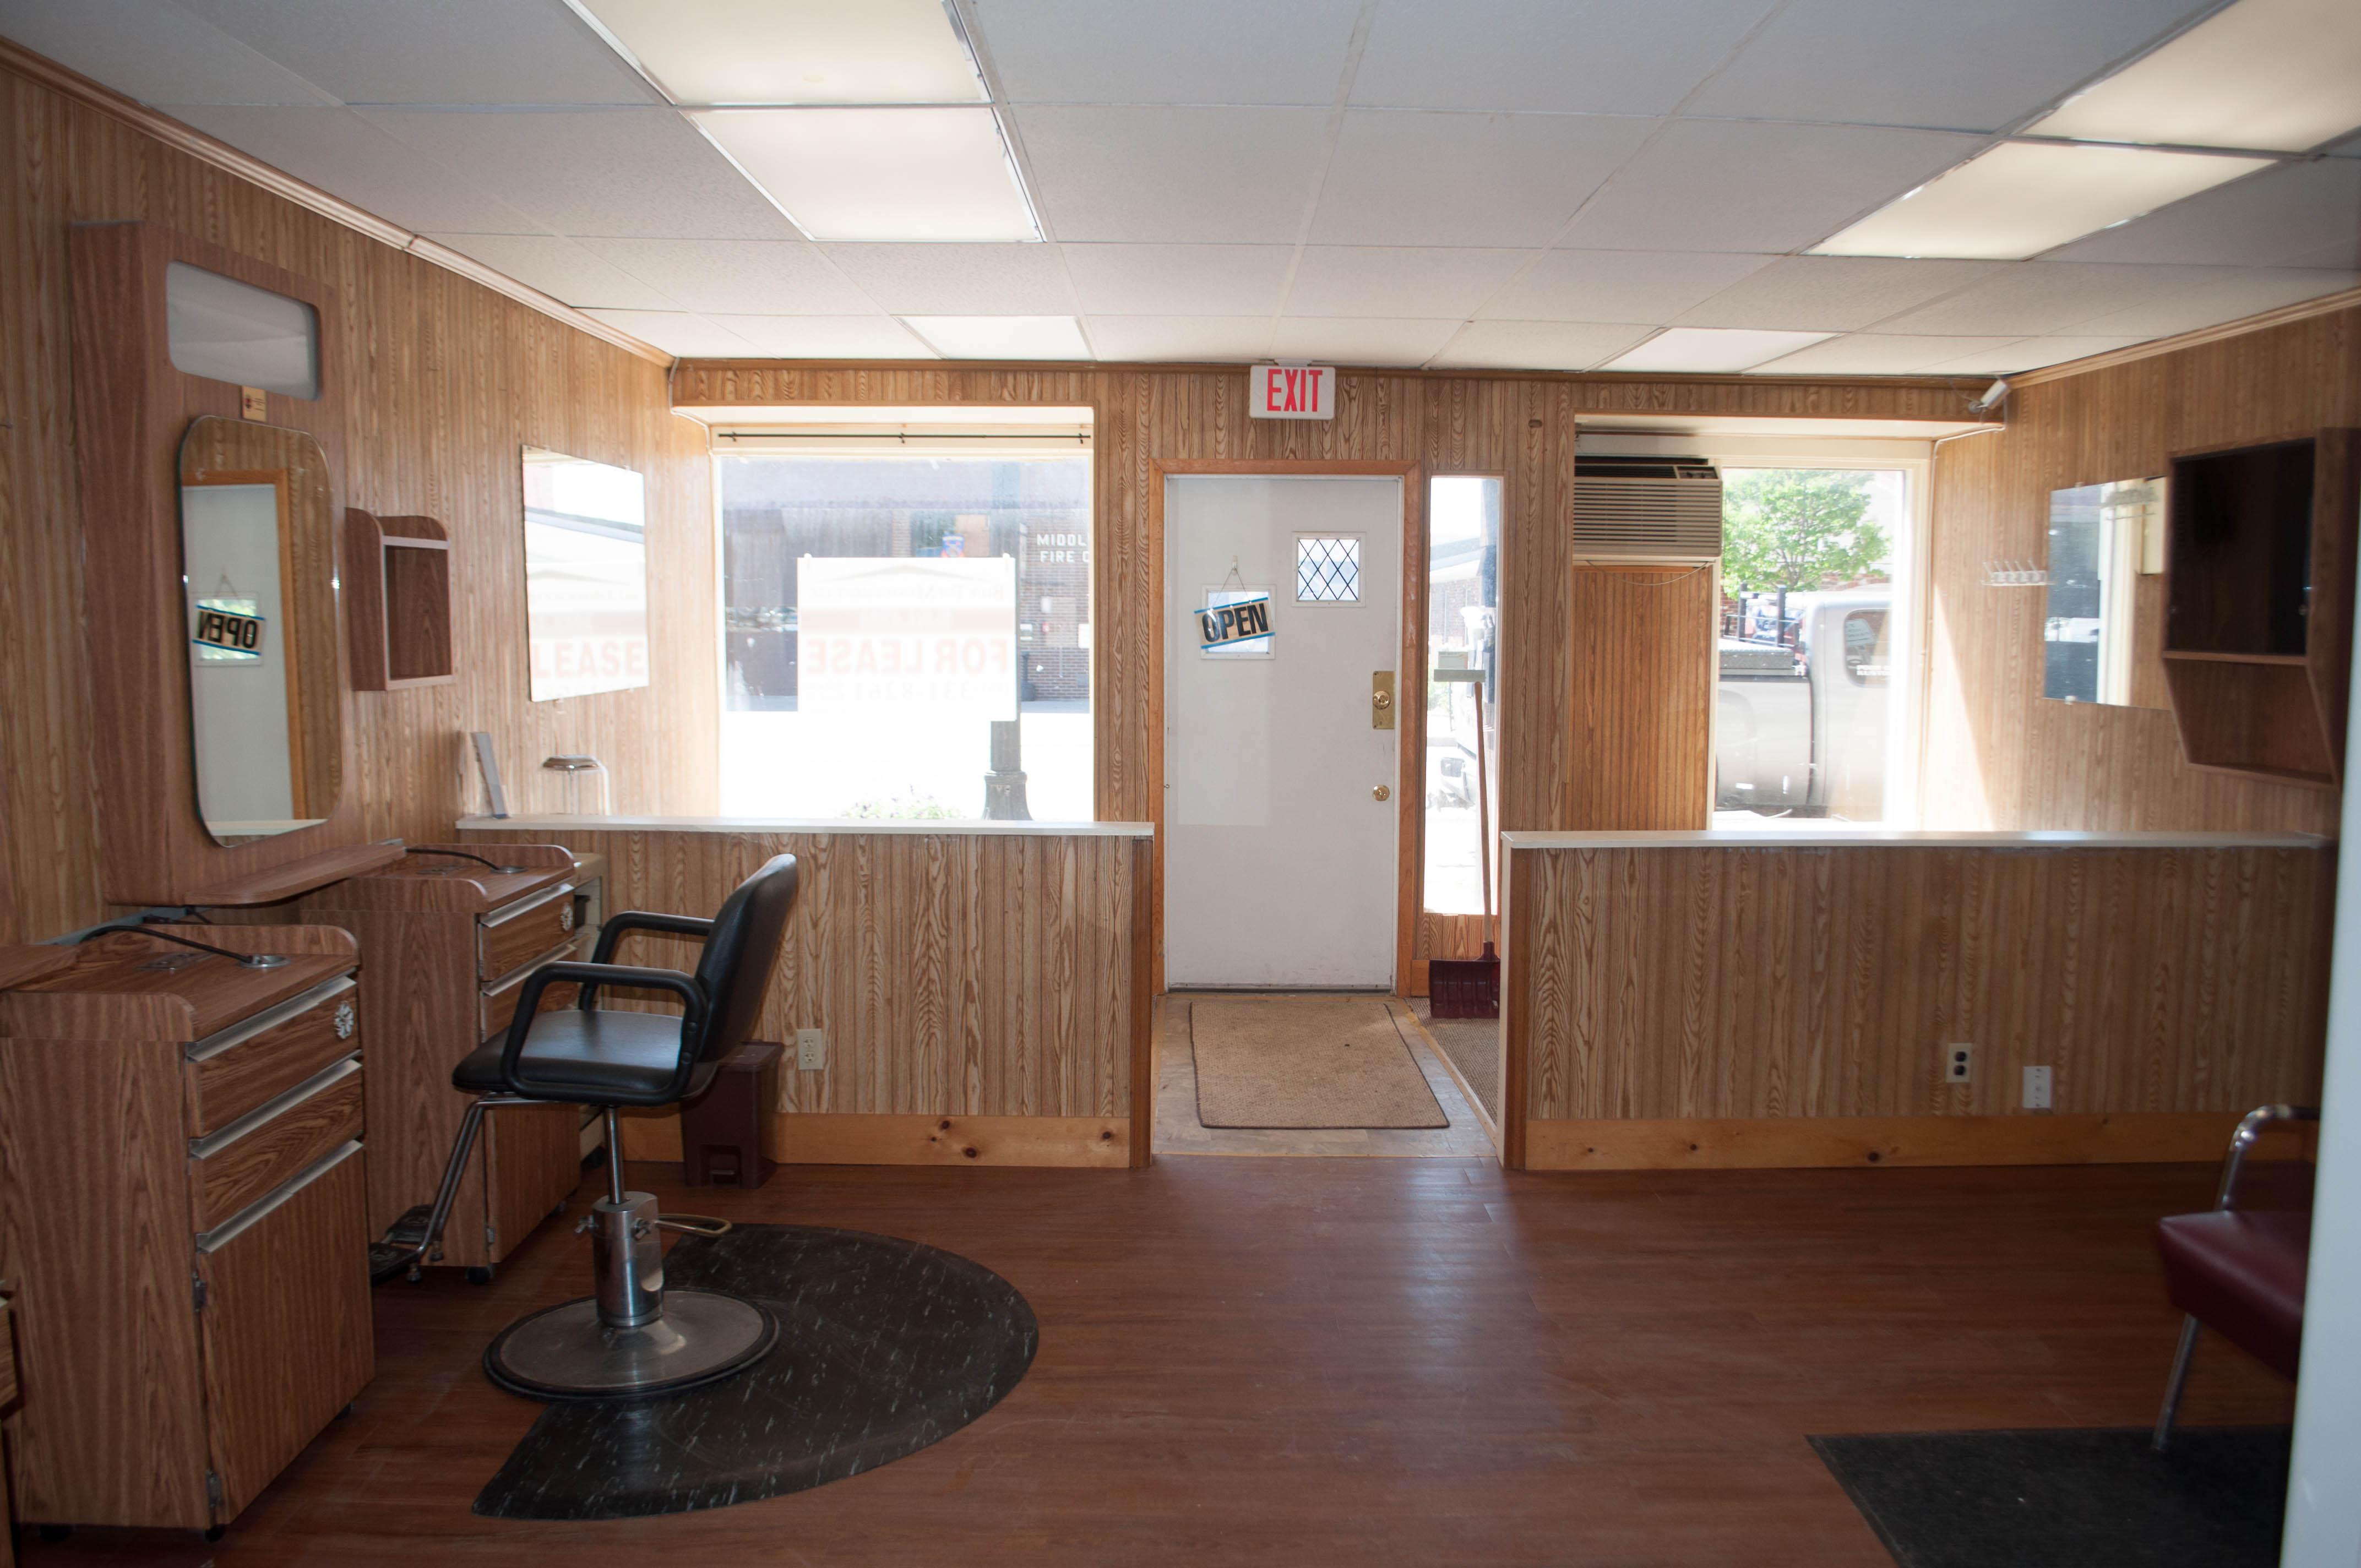 Salon stations for rent hair salon for rent u2013 for Adagio salon eagle co